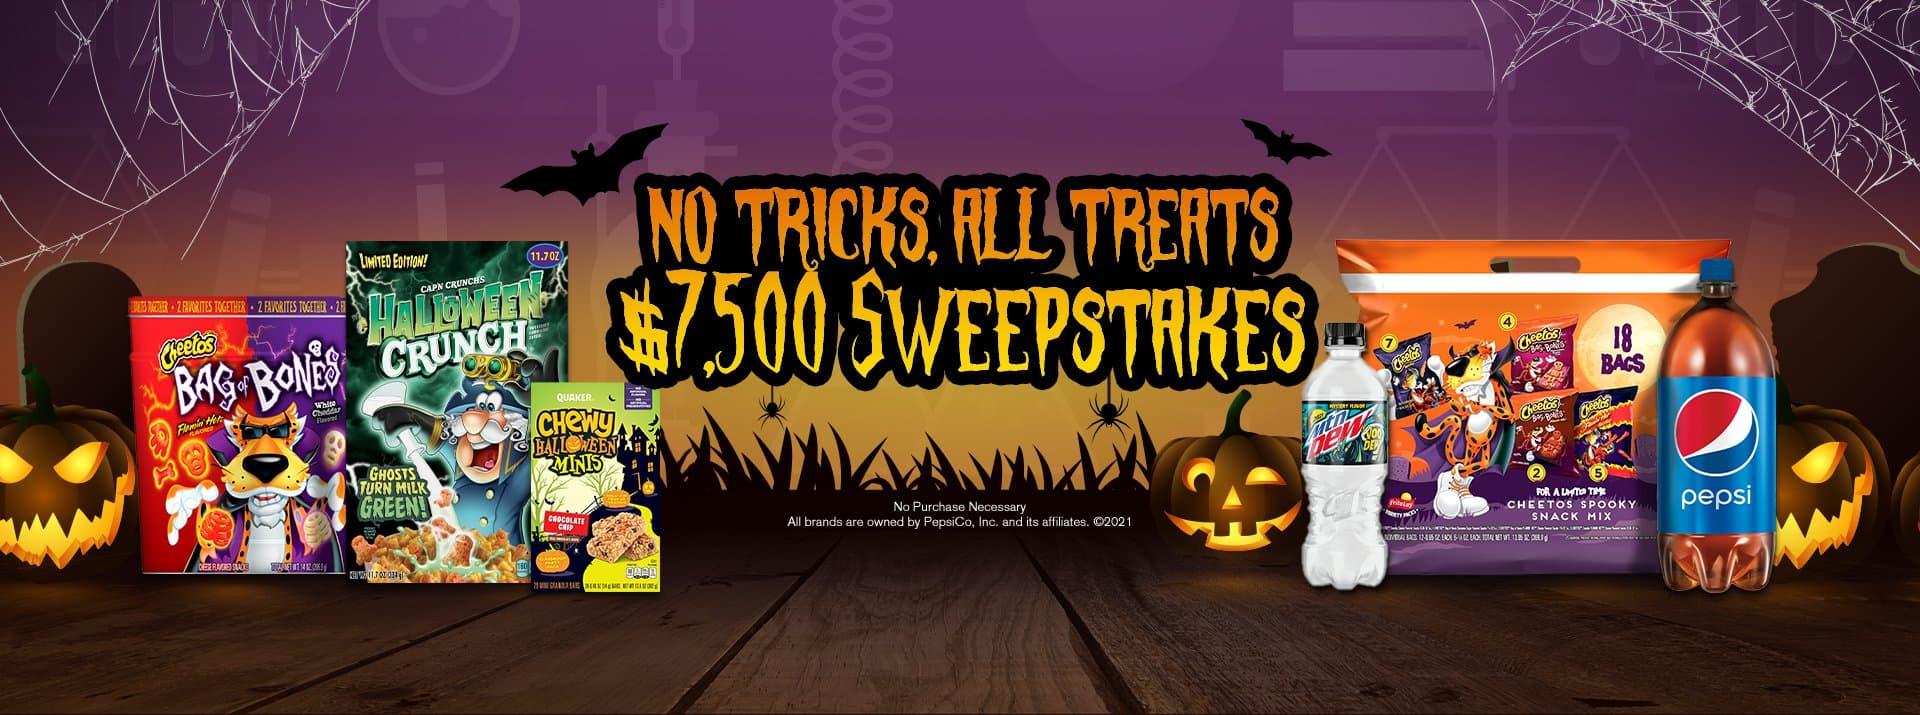 Tasty Rewards No Tricks, All Treats Sweepstakes 2021